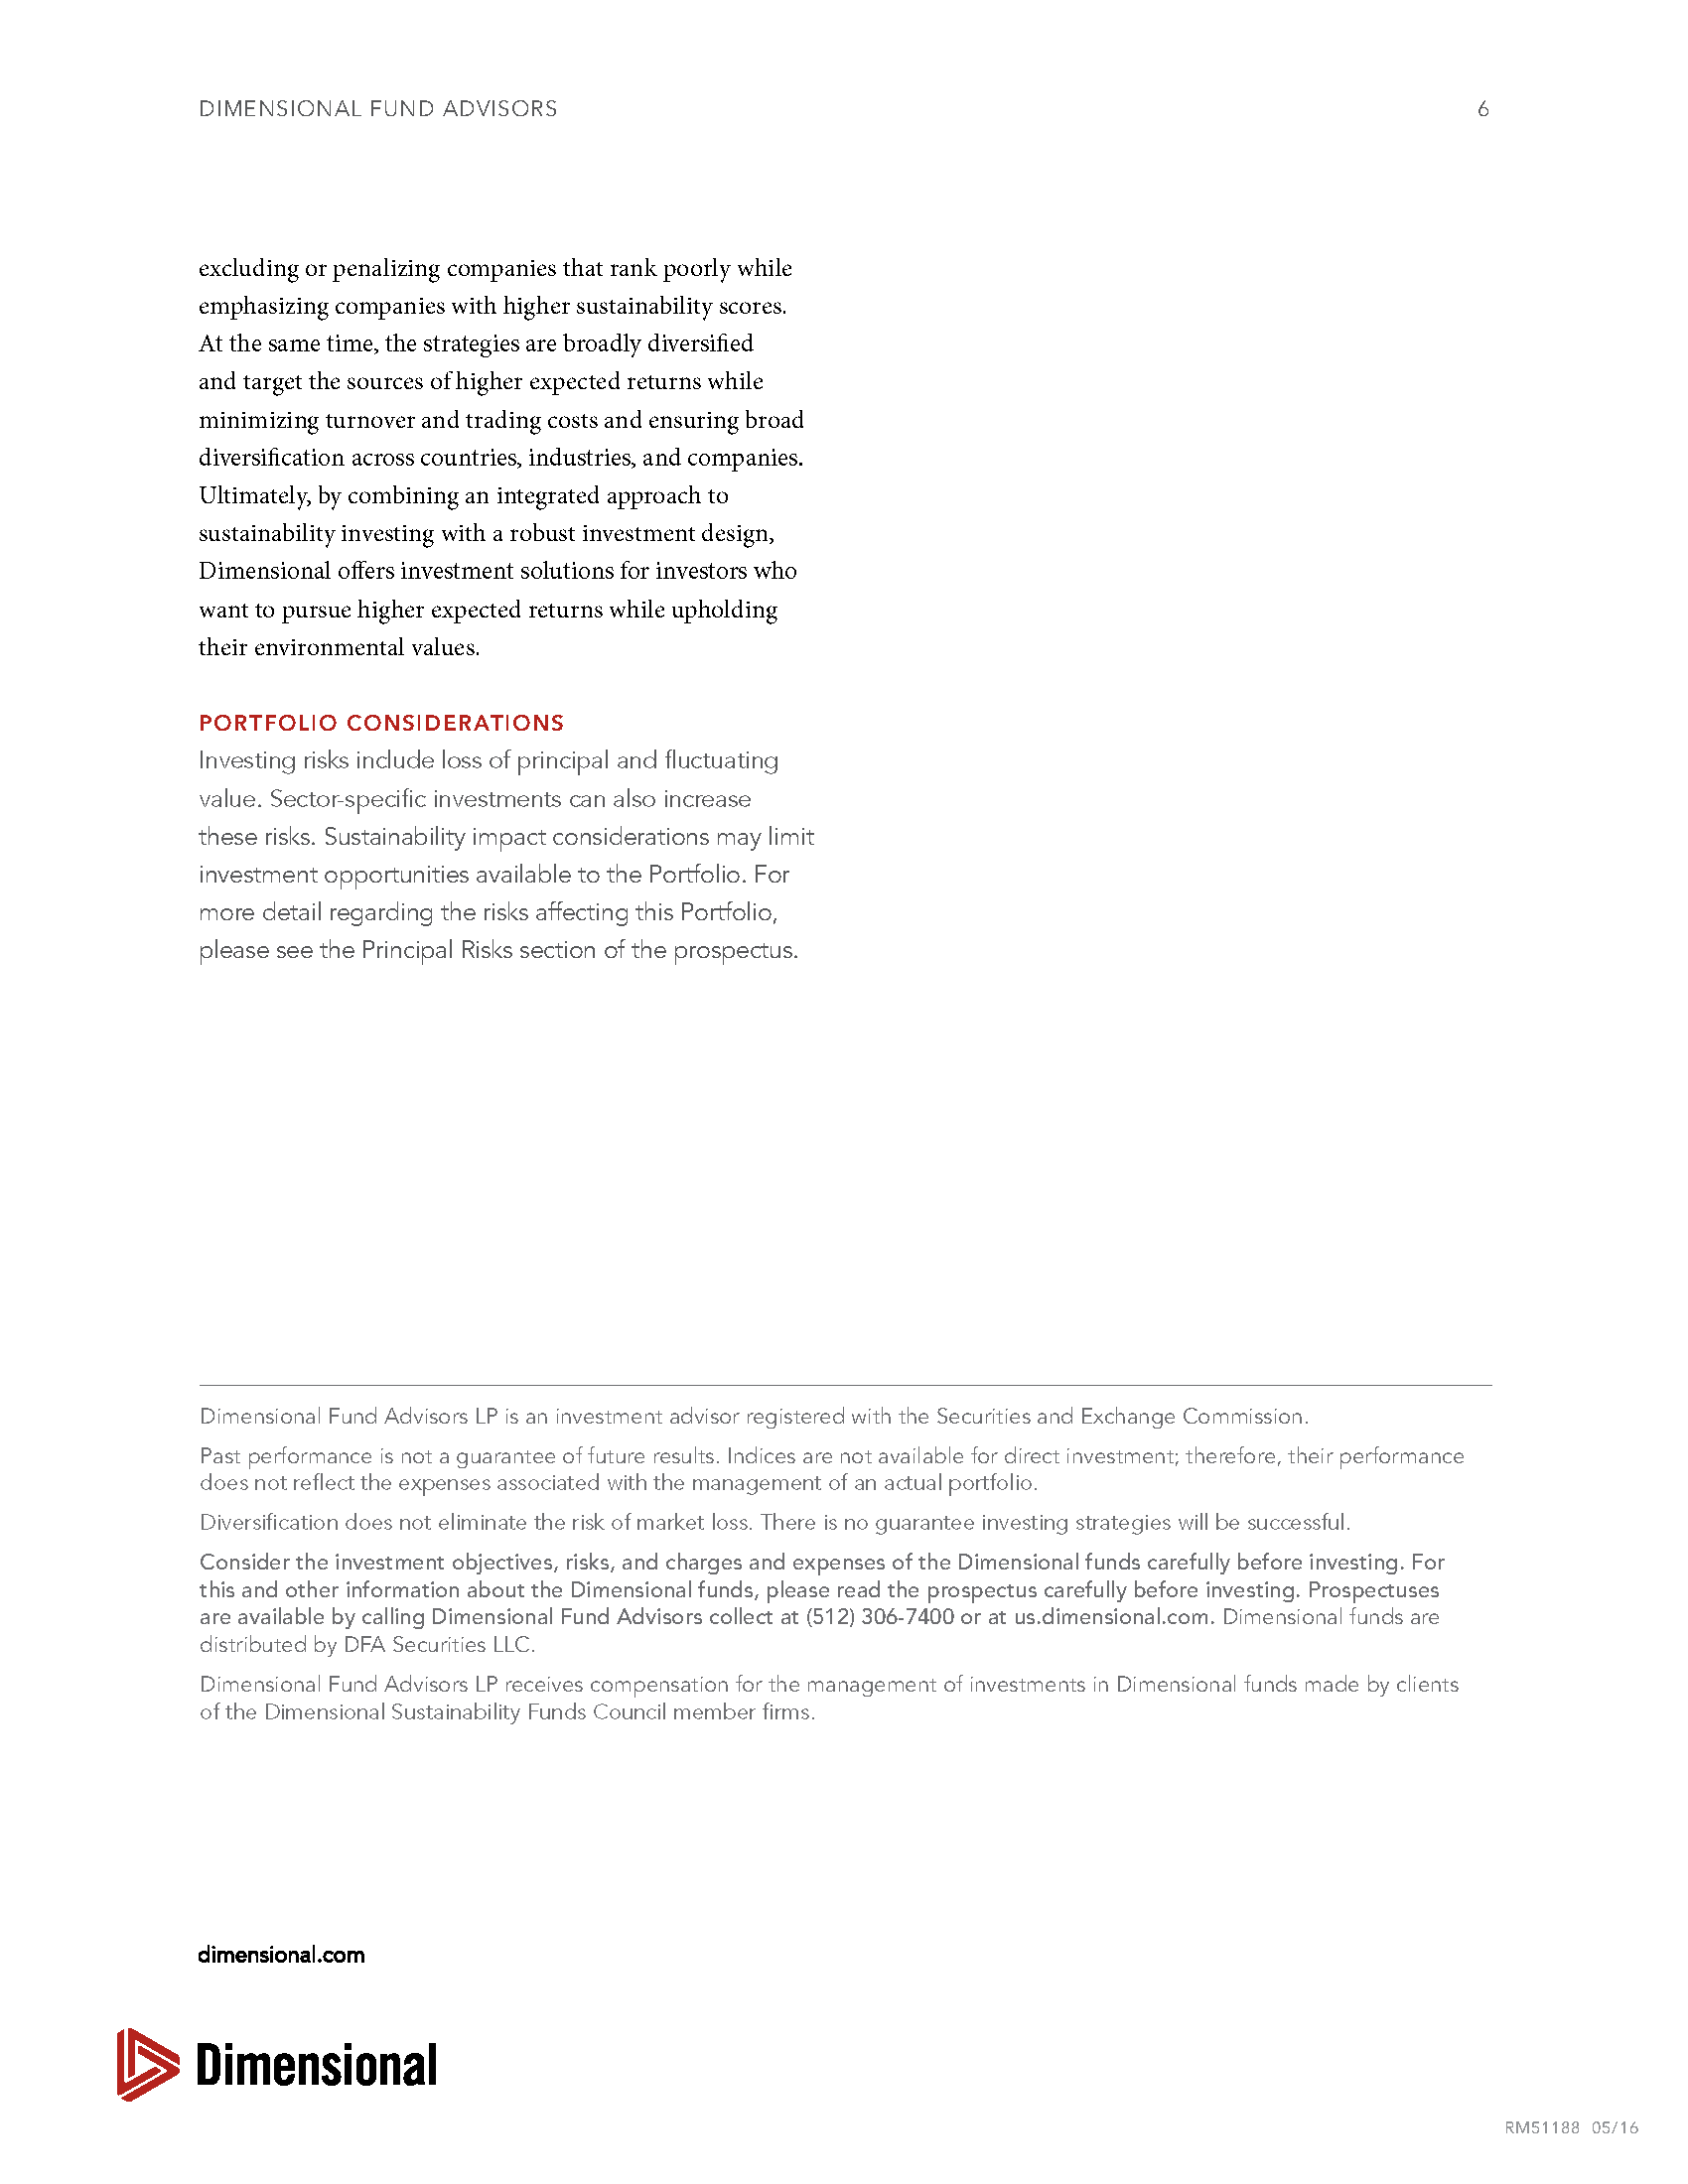 Sustainability Investing CFP DFA 6